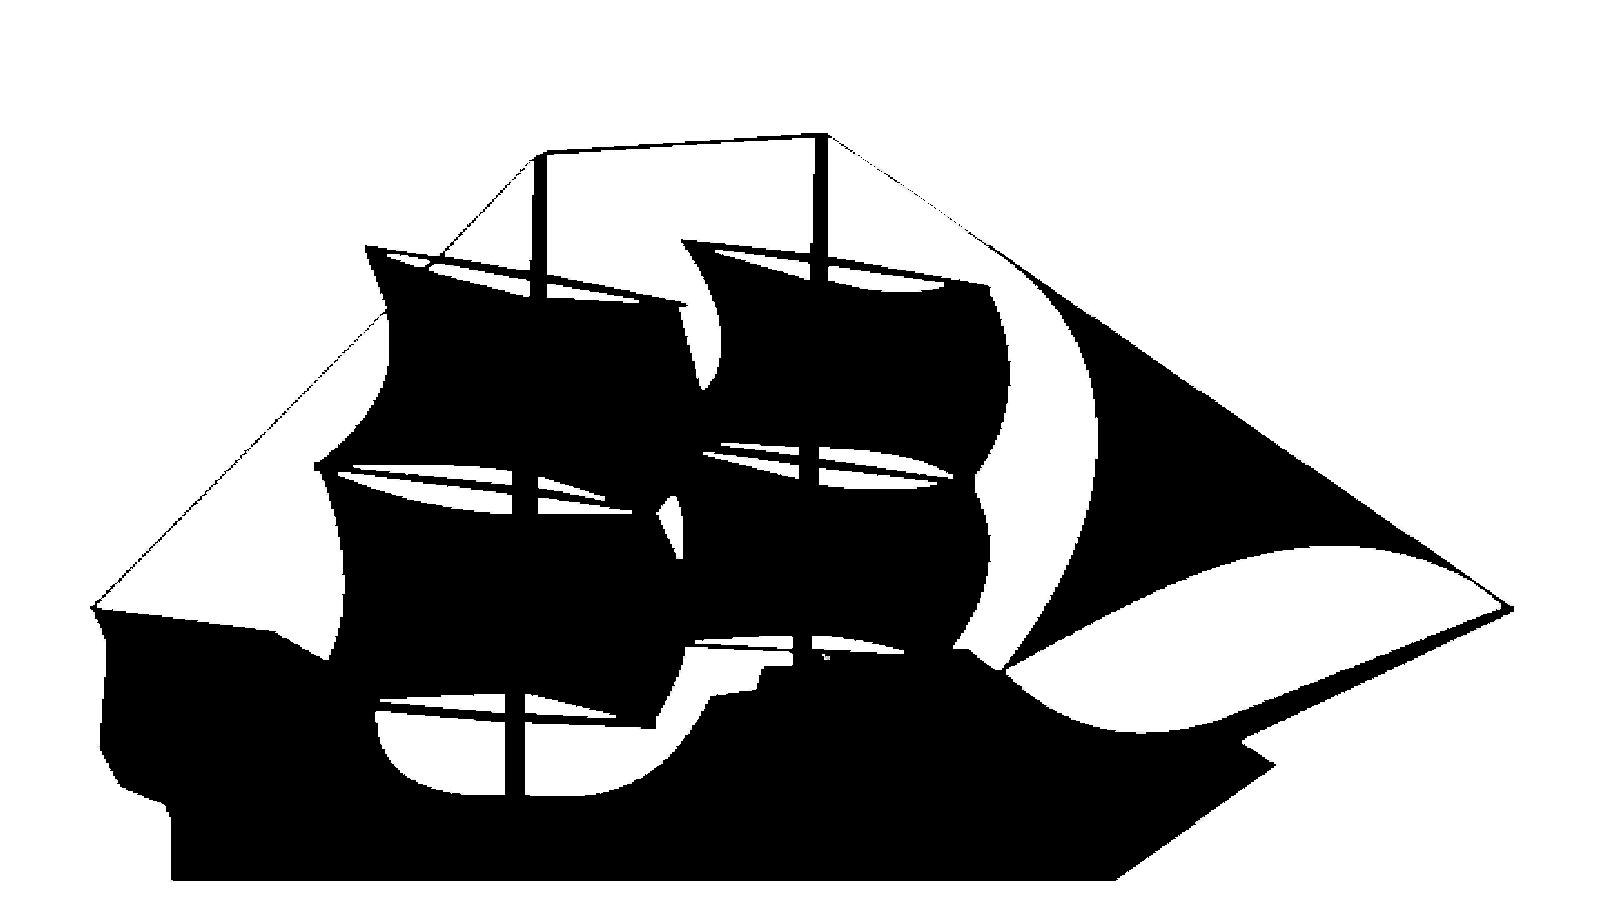 mascara silhueta navio tr_1920x1080